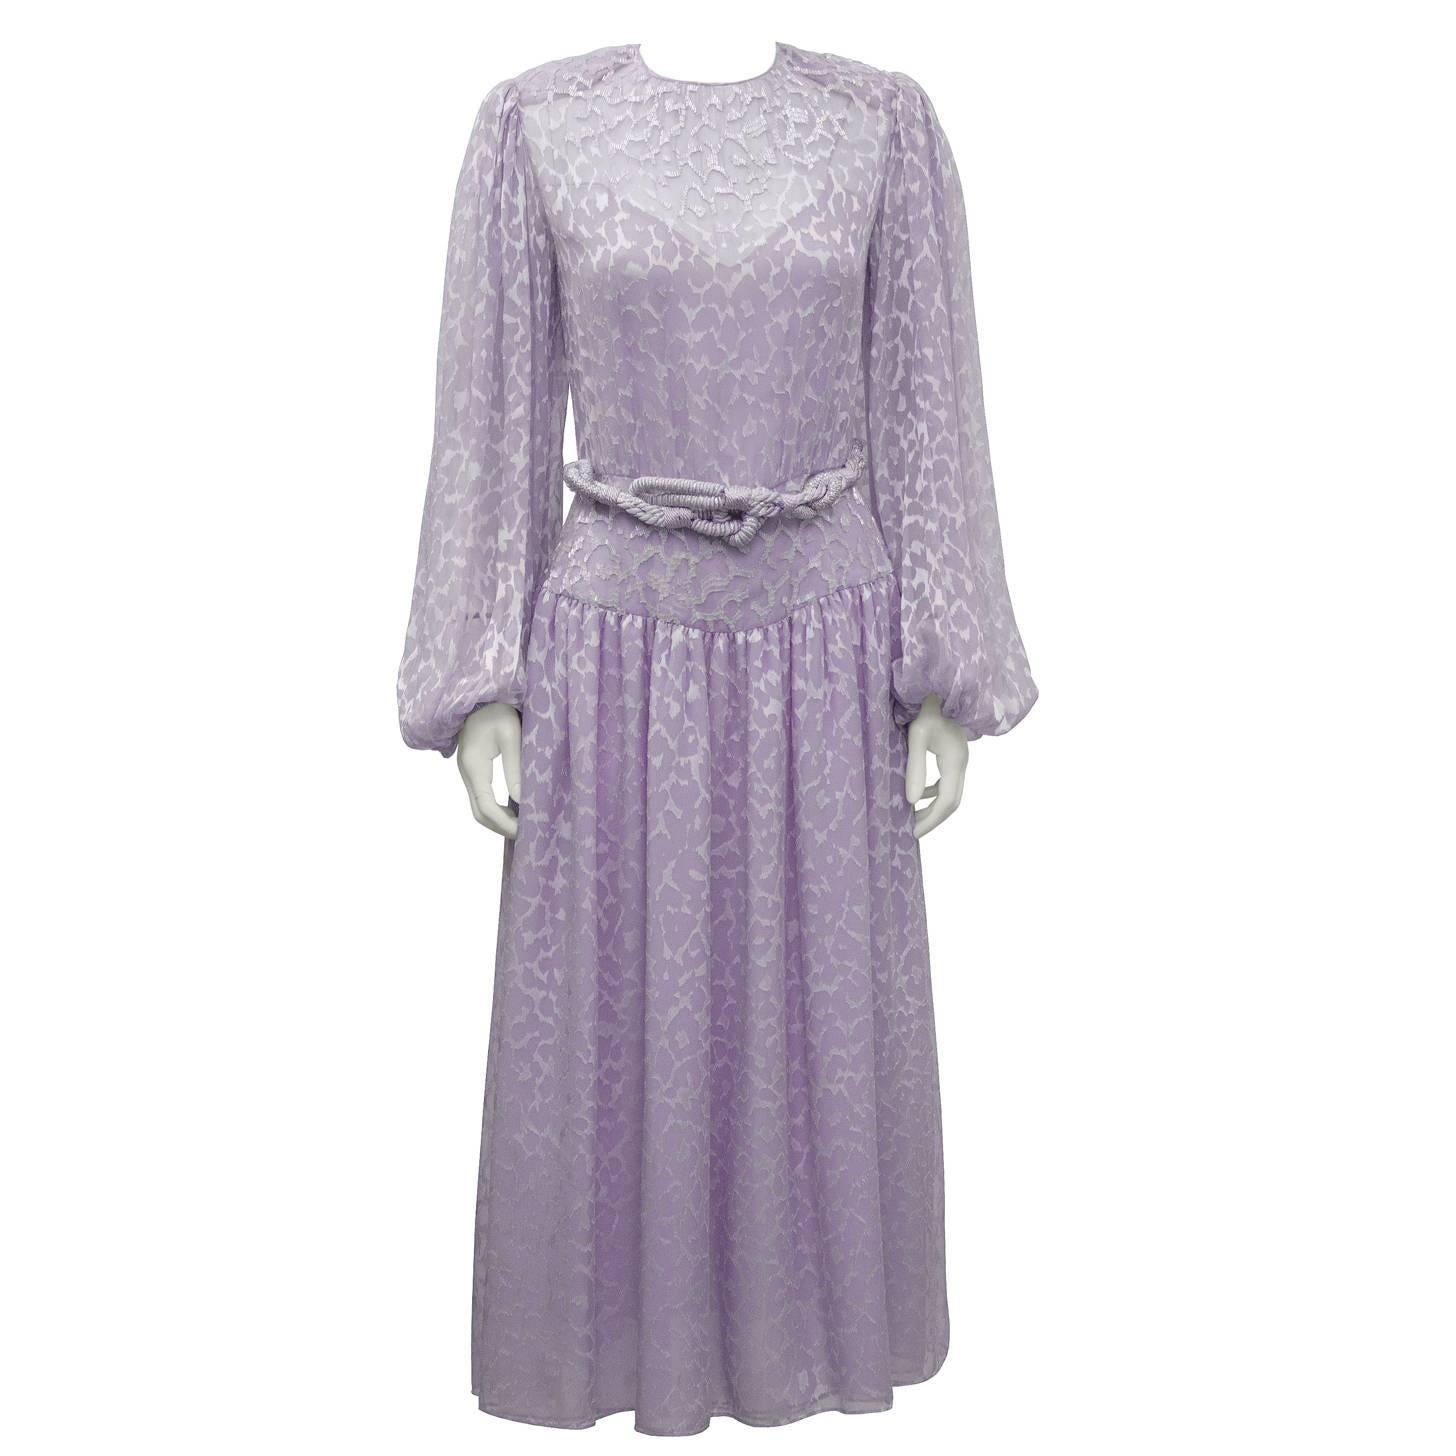 1980's Oscar de la Renta Lavender Chiffon Beaded Evening Dress